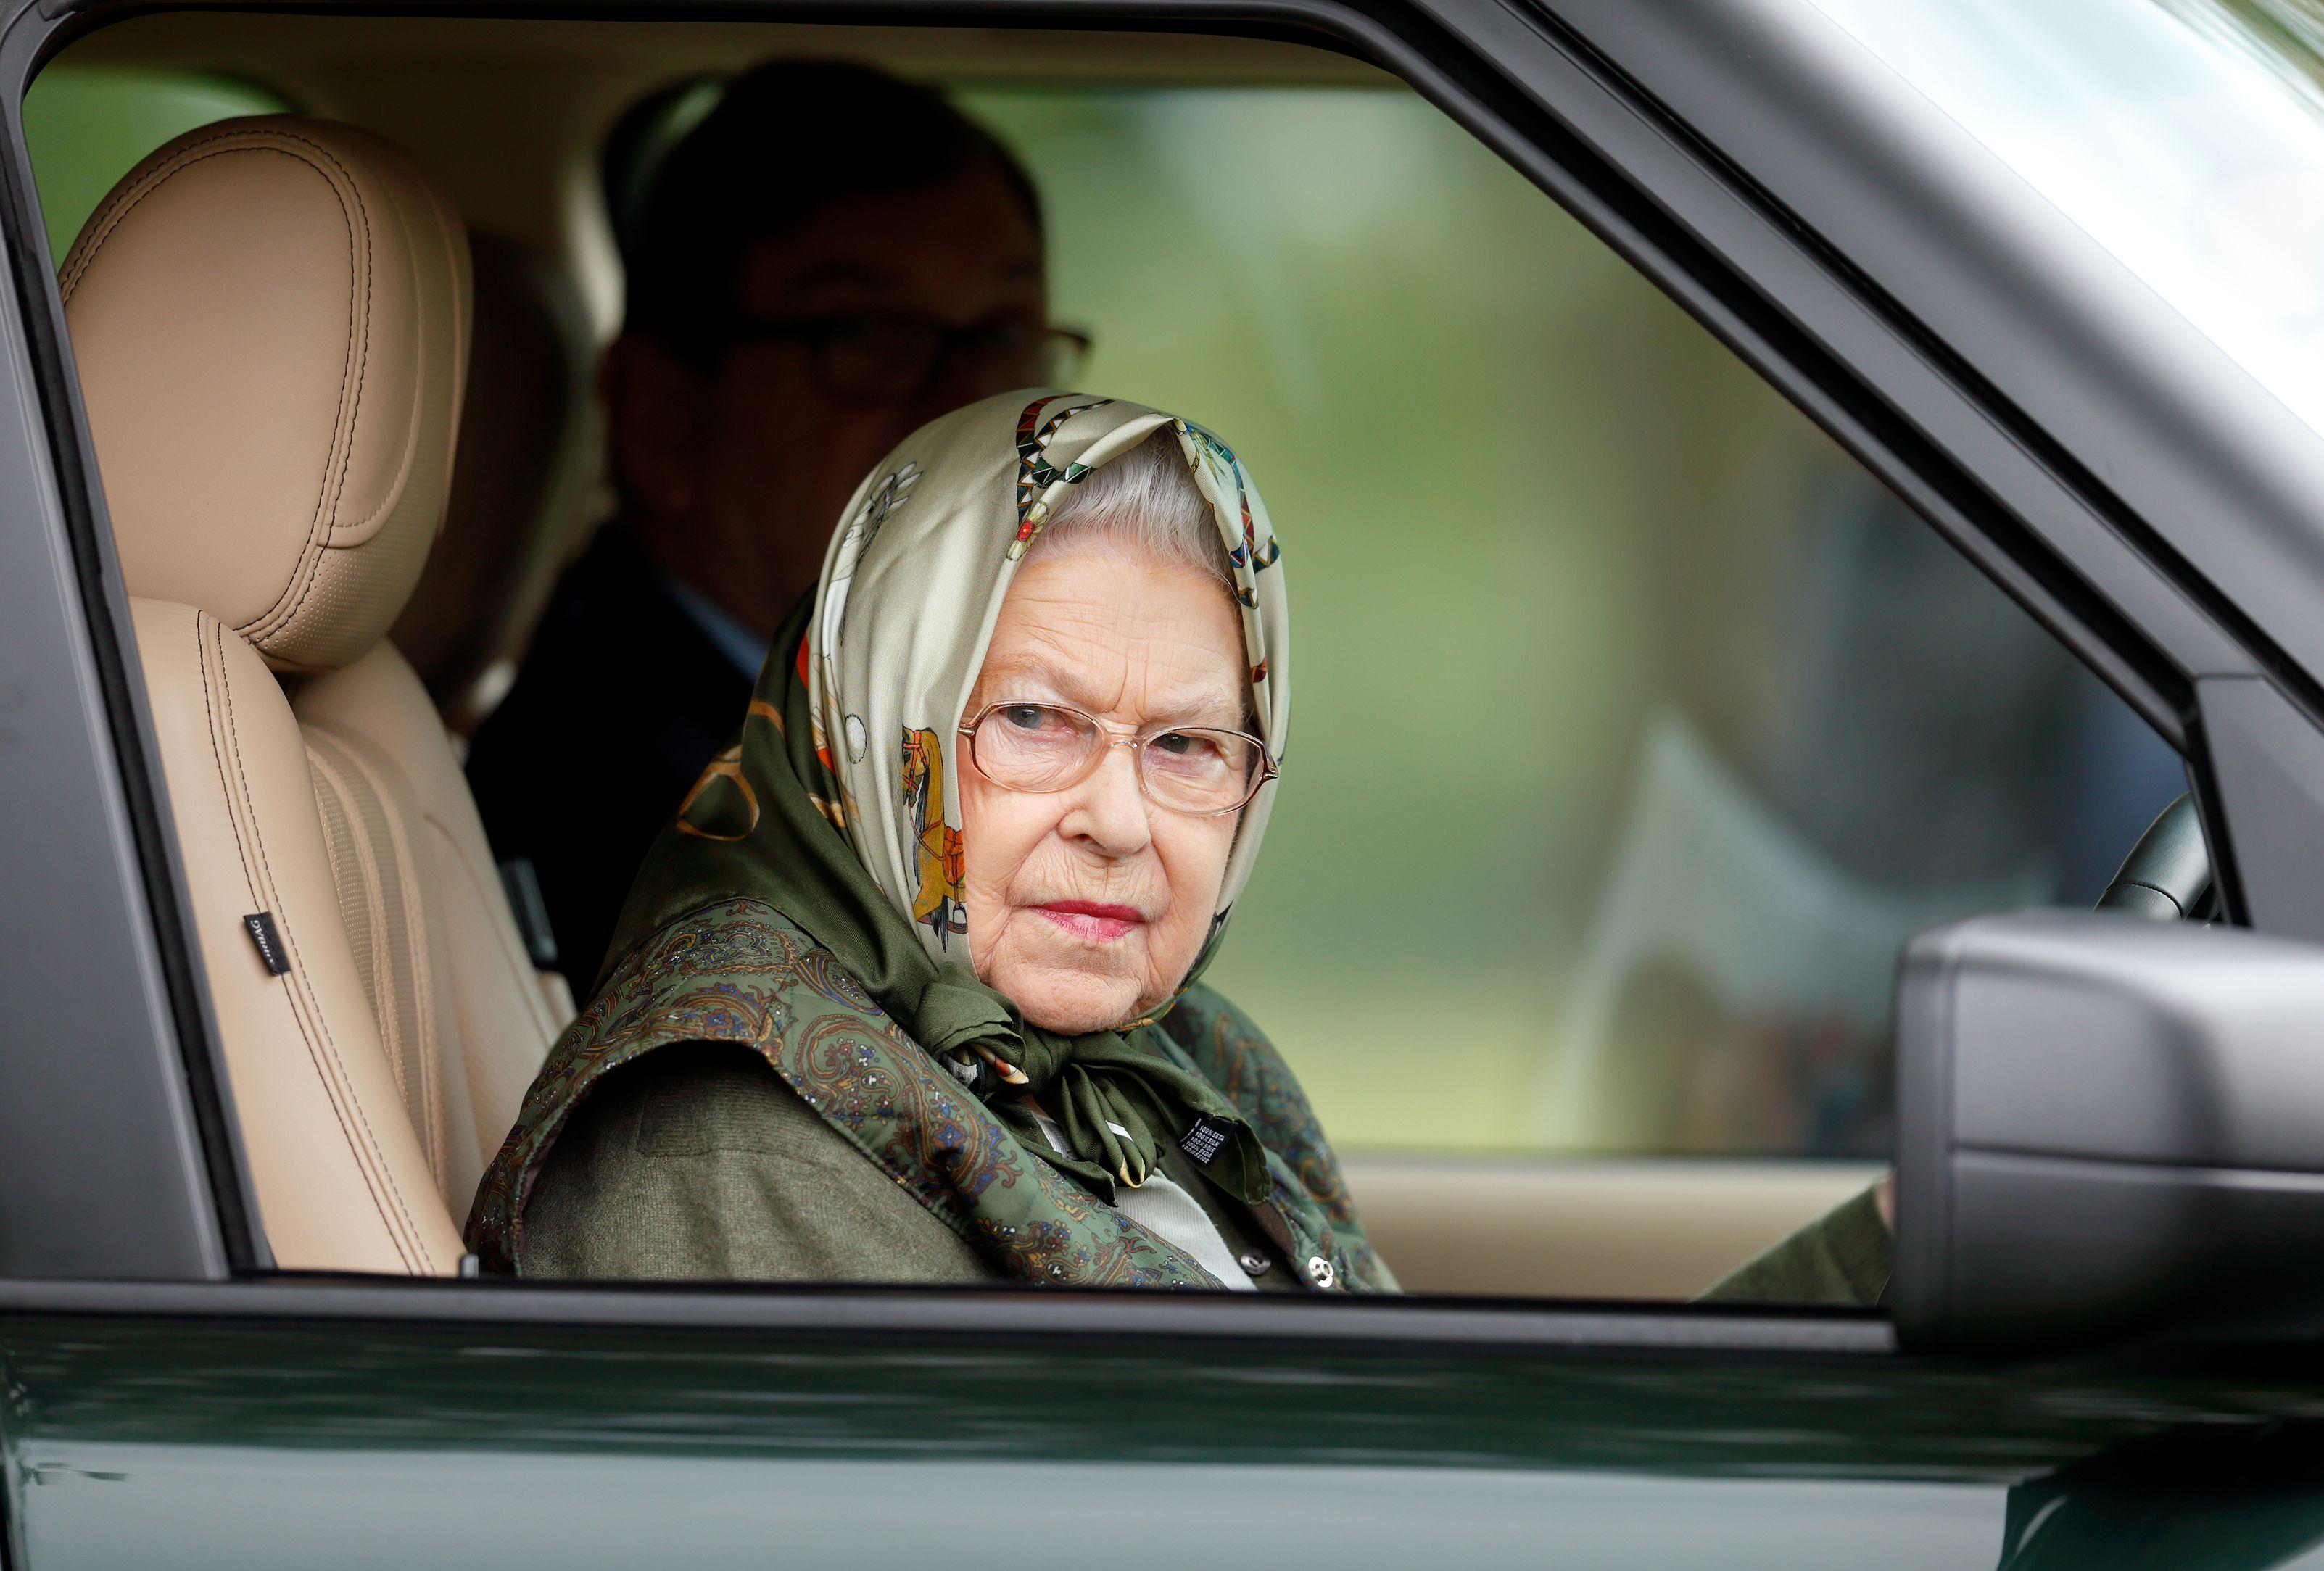 20 Times Queen Elizabeth Was A Total Badass